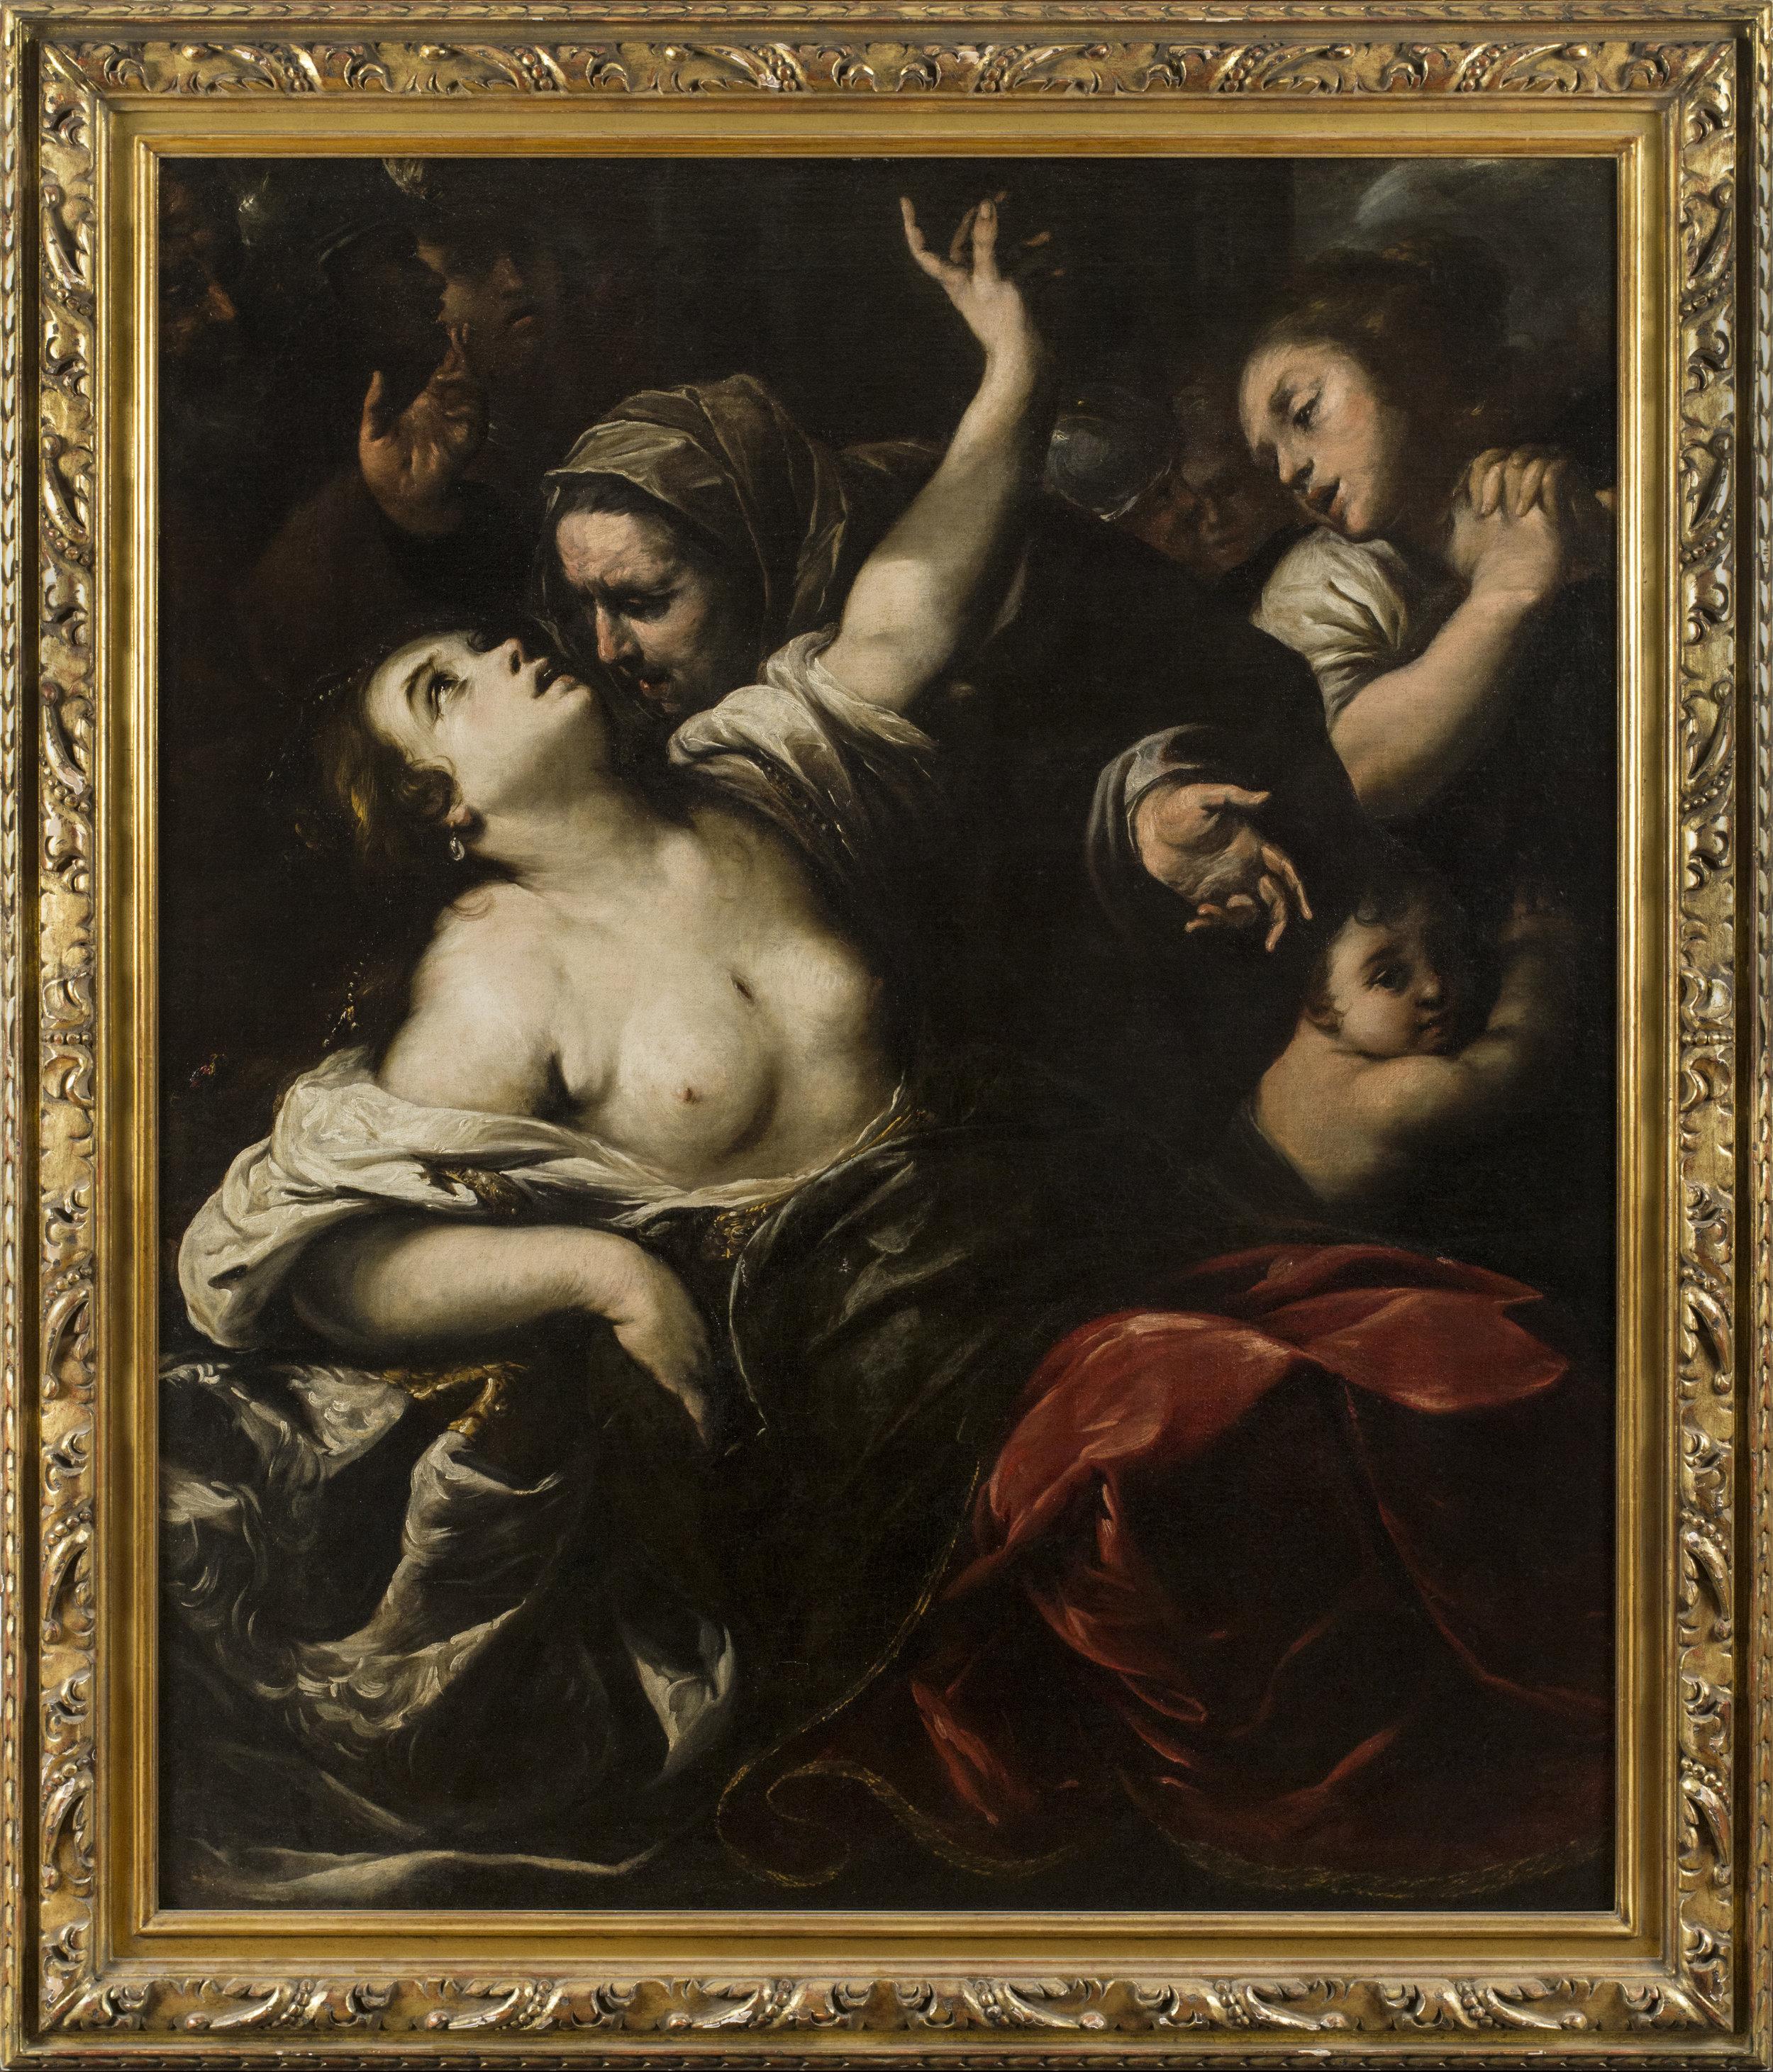 Carlo Francesco Nuvolone,  The Death of Dido, Queen of Carthage